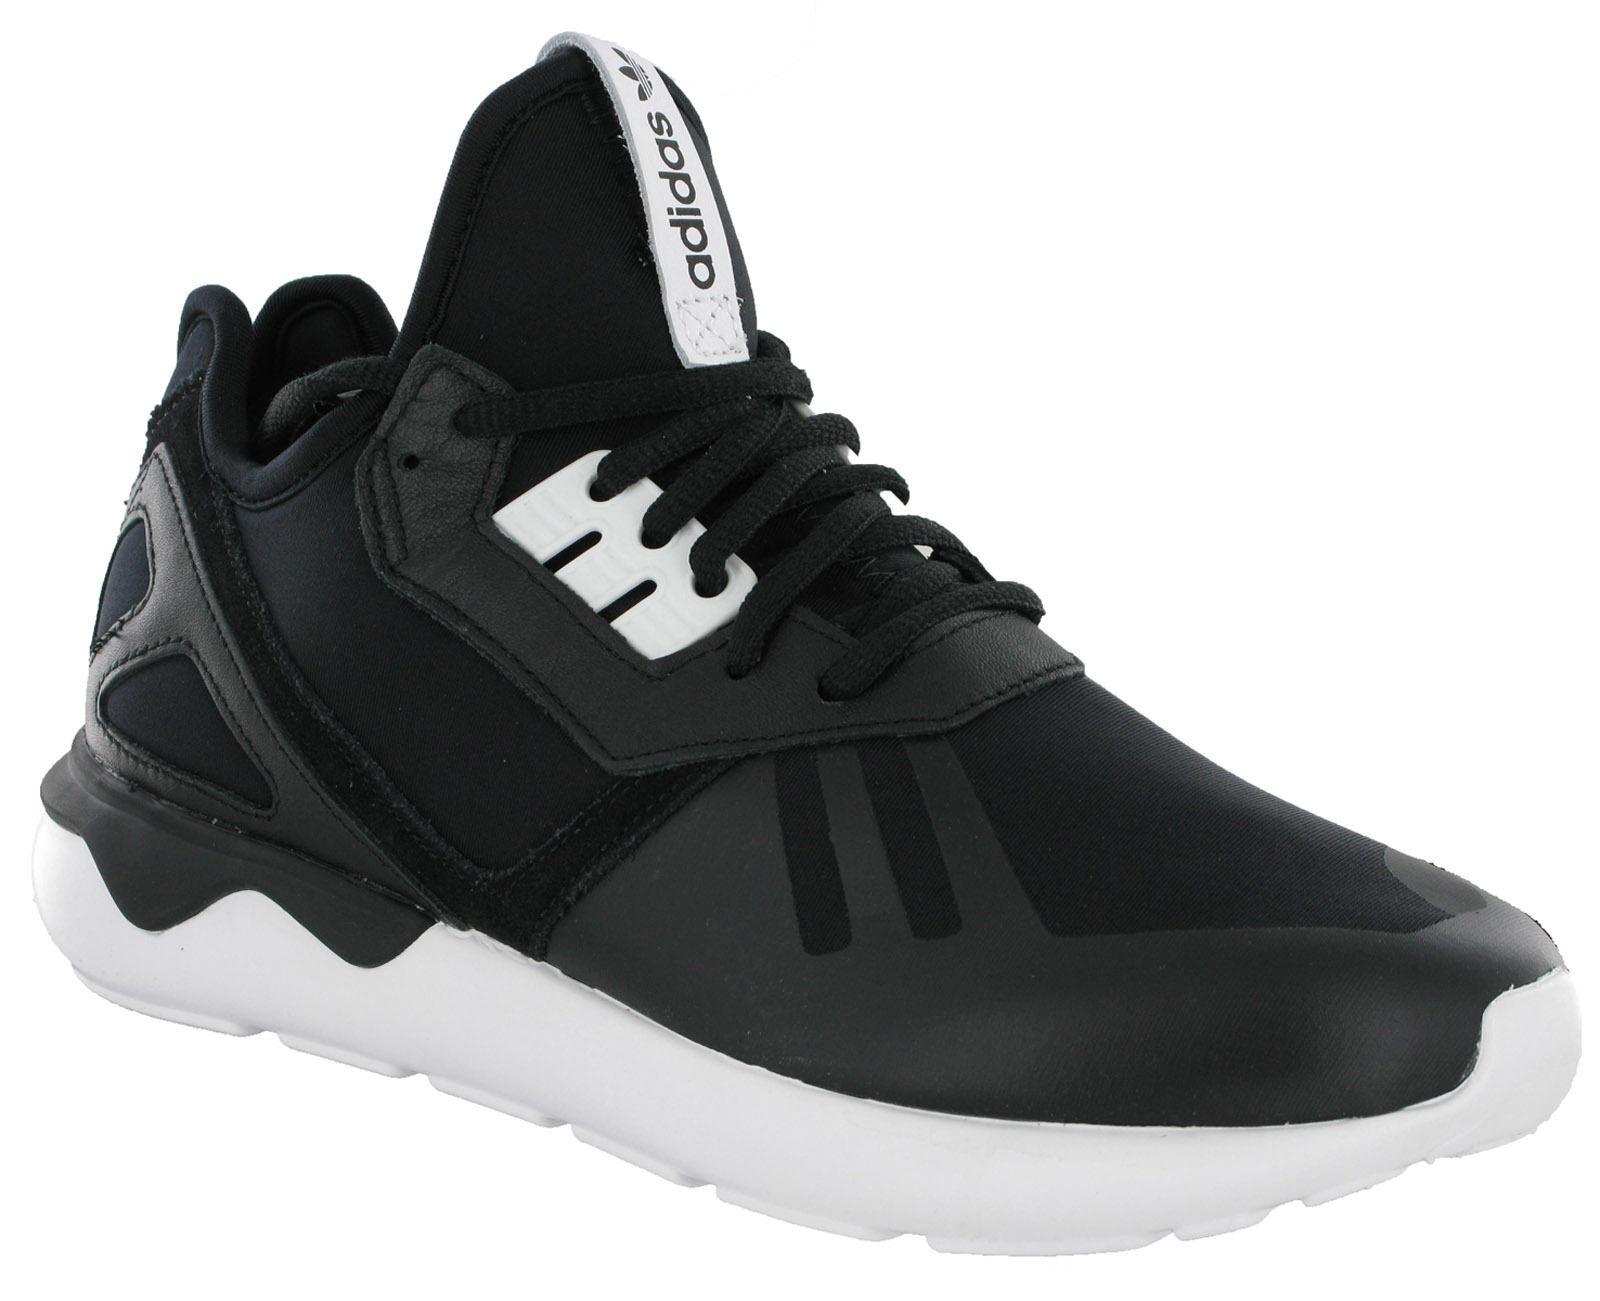 adidas black tubuläre läufer ausbilder männer laufen uk6.5-12 black adidas lace neopren - sport 7548e8